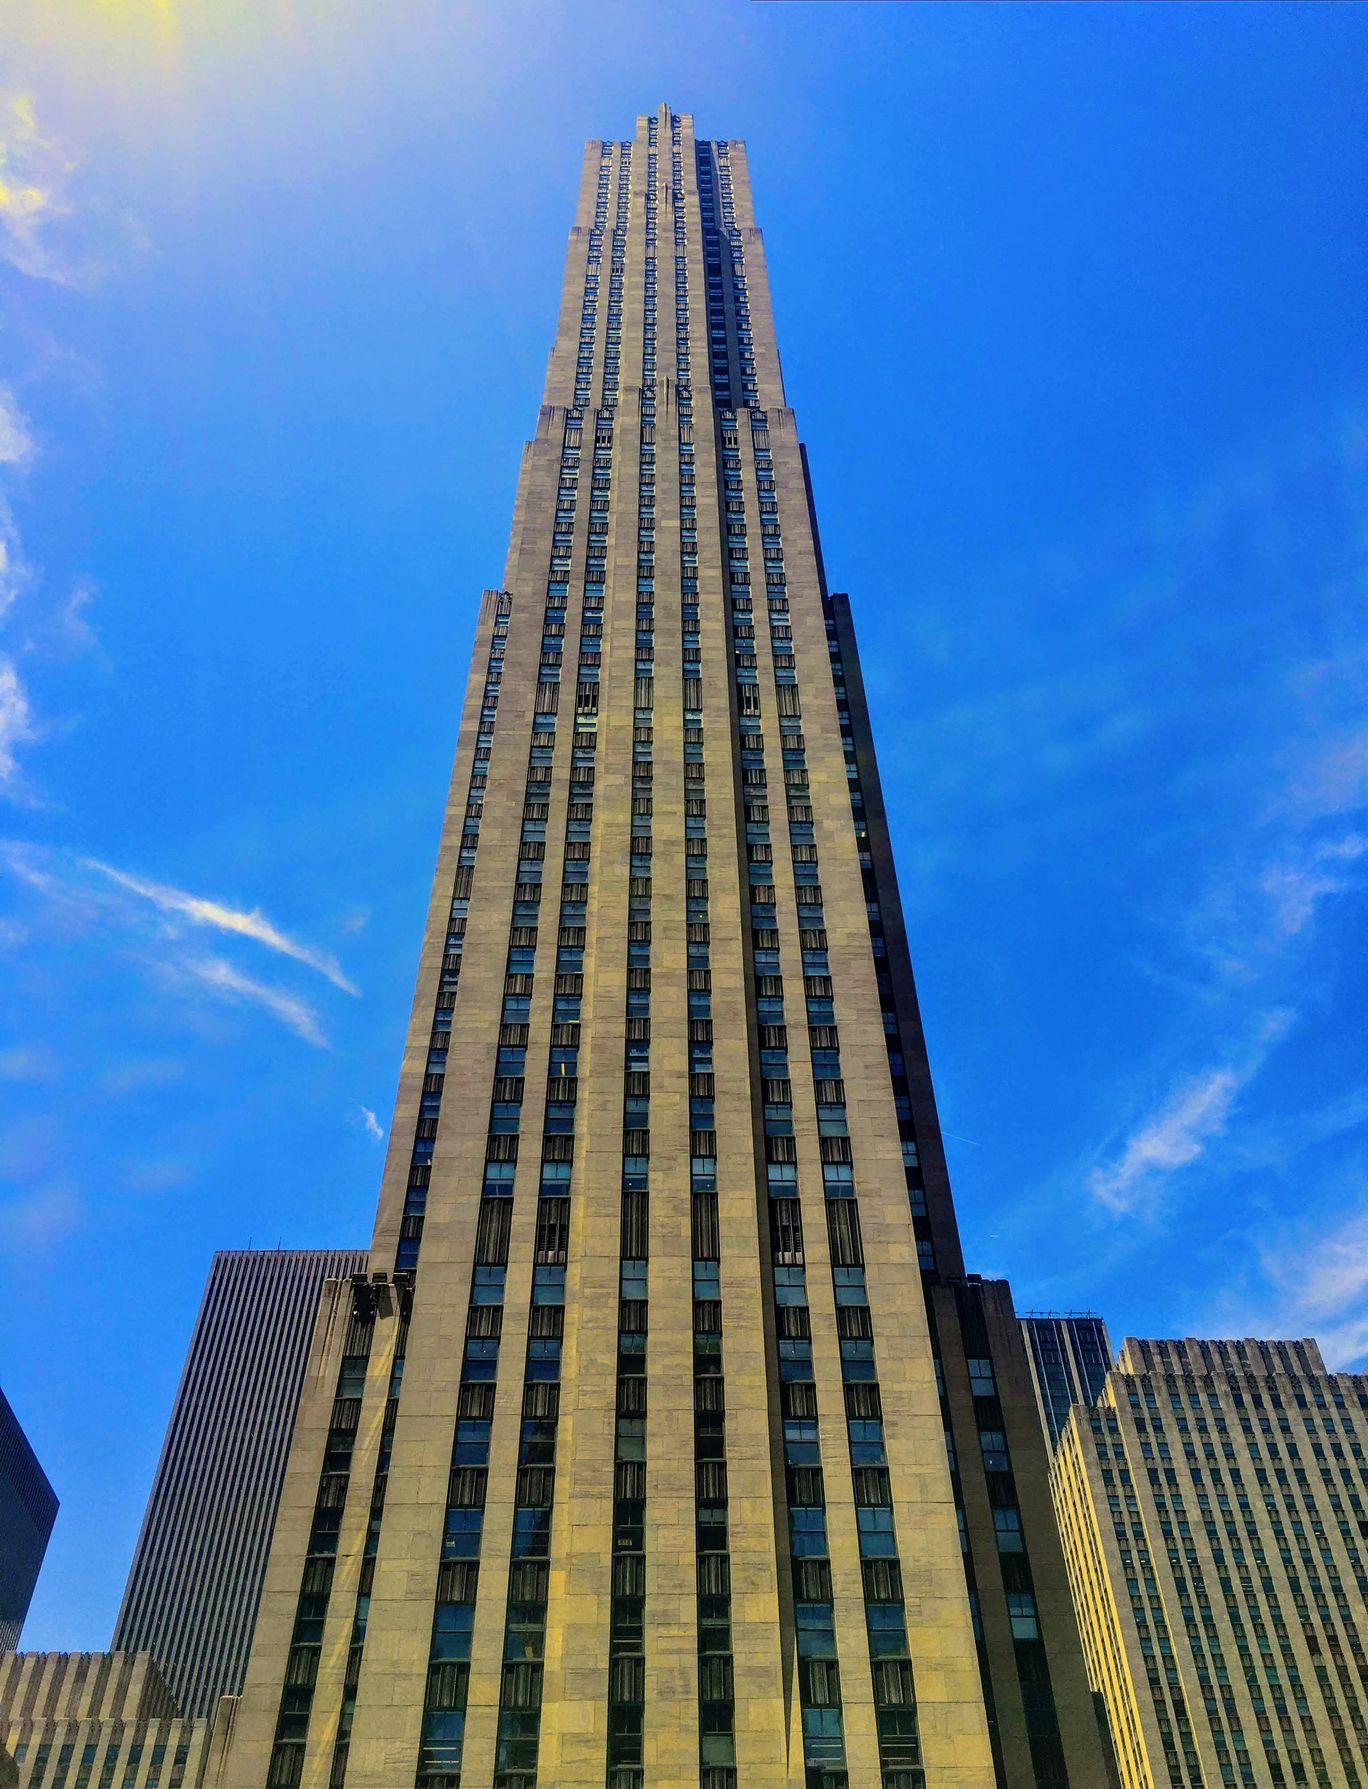 Photo of Rockefeller Center By Ipsa S Yadav